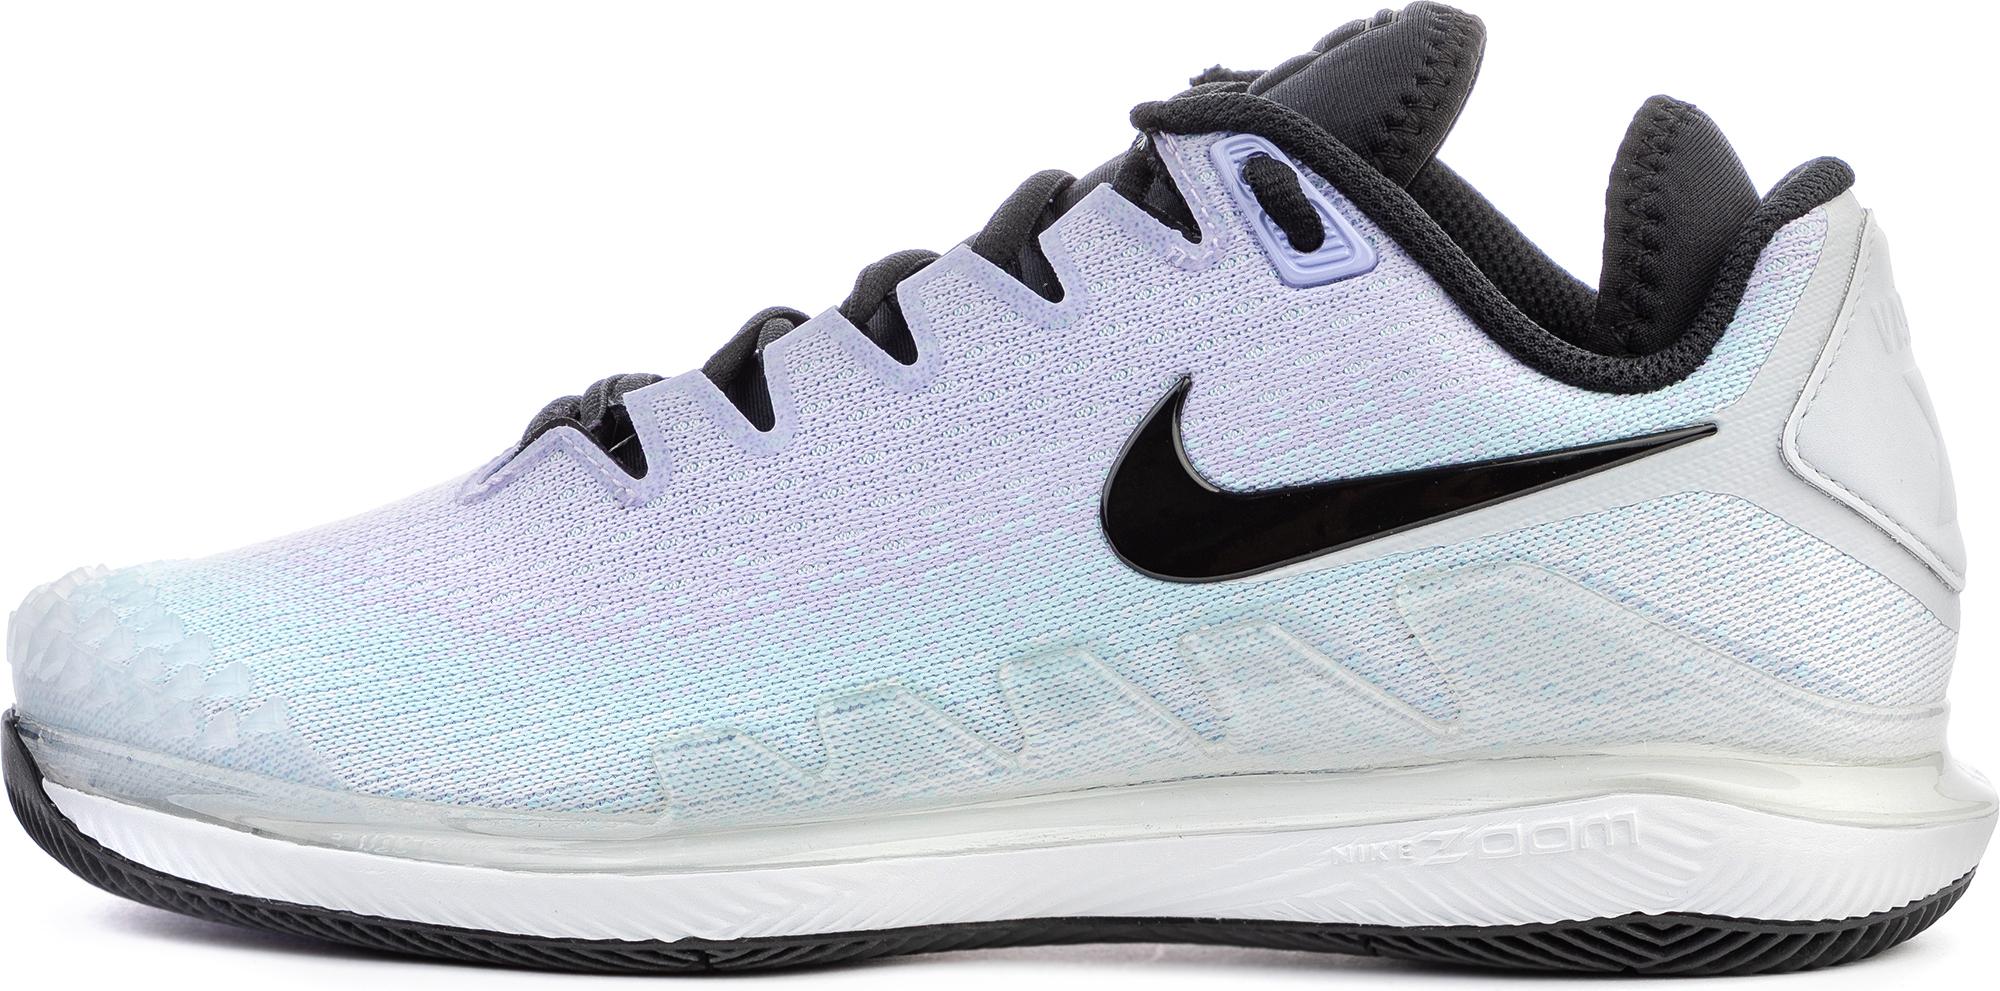 Nike Кроссовки женские Nike Air Zoom Vapor X Knit, размер 41